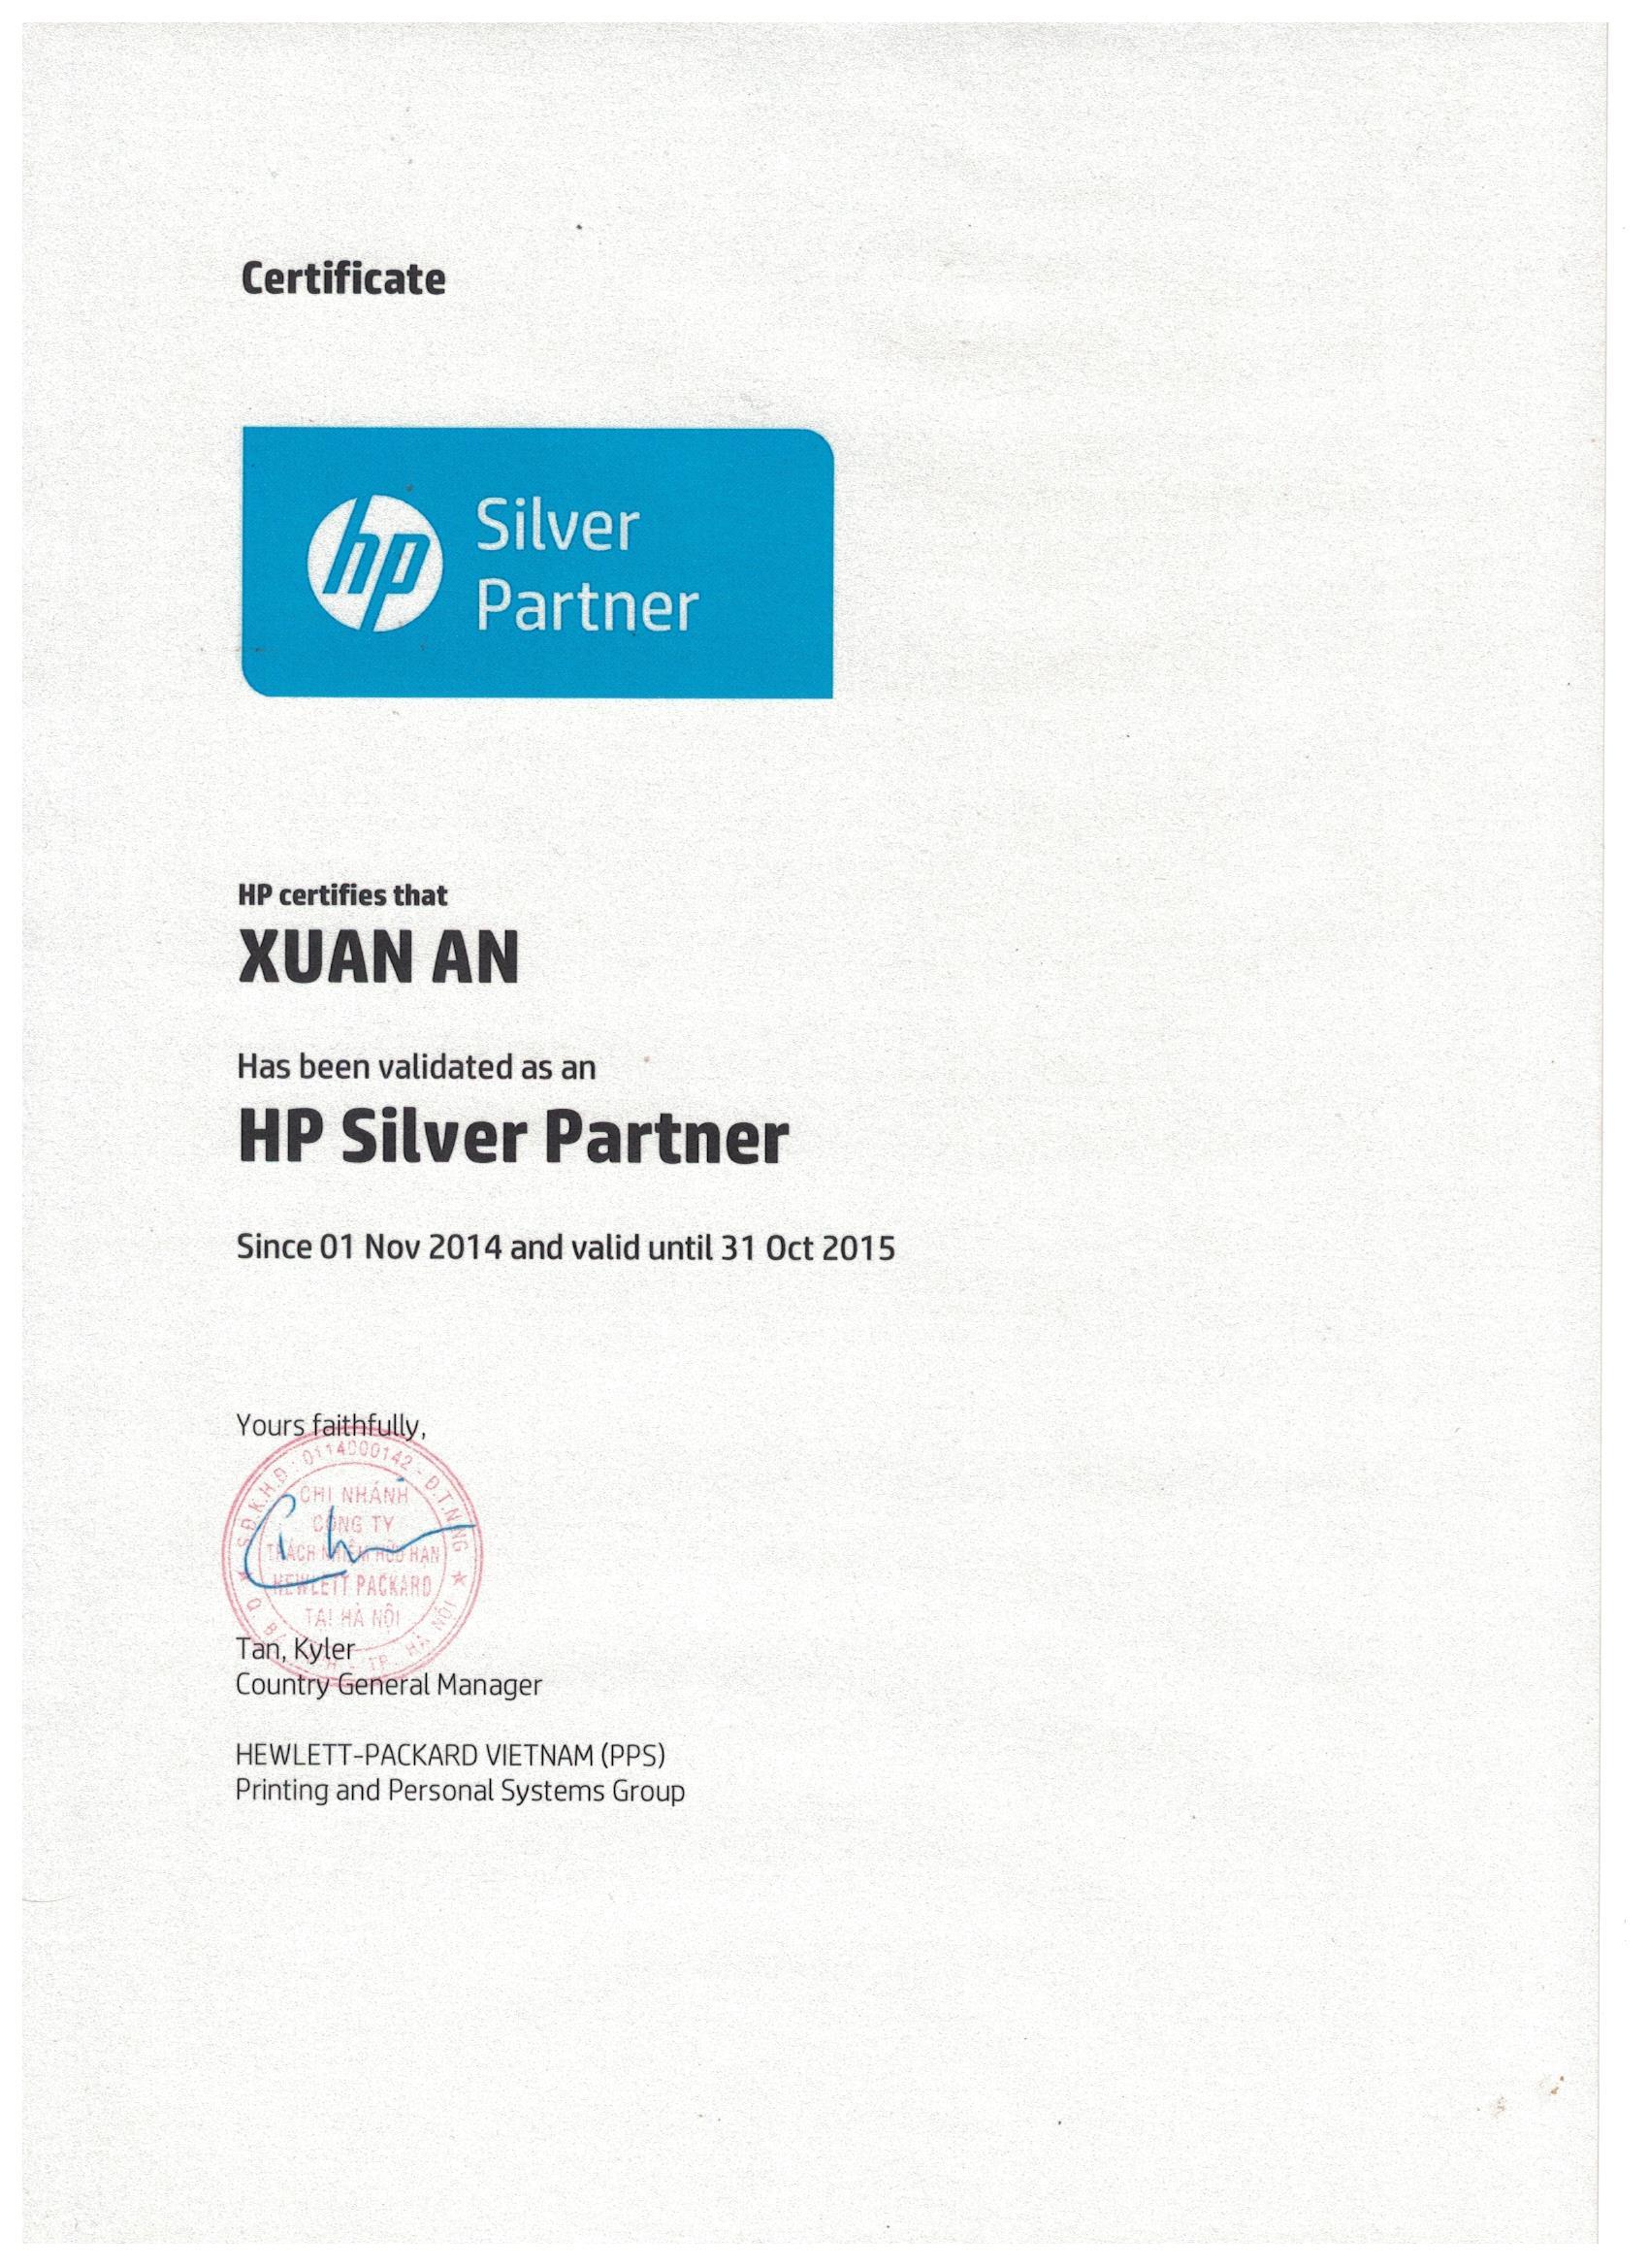 HP Probook 450 G4 - Z6T31PA (Silver)